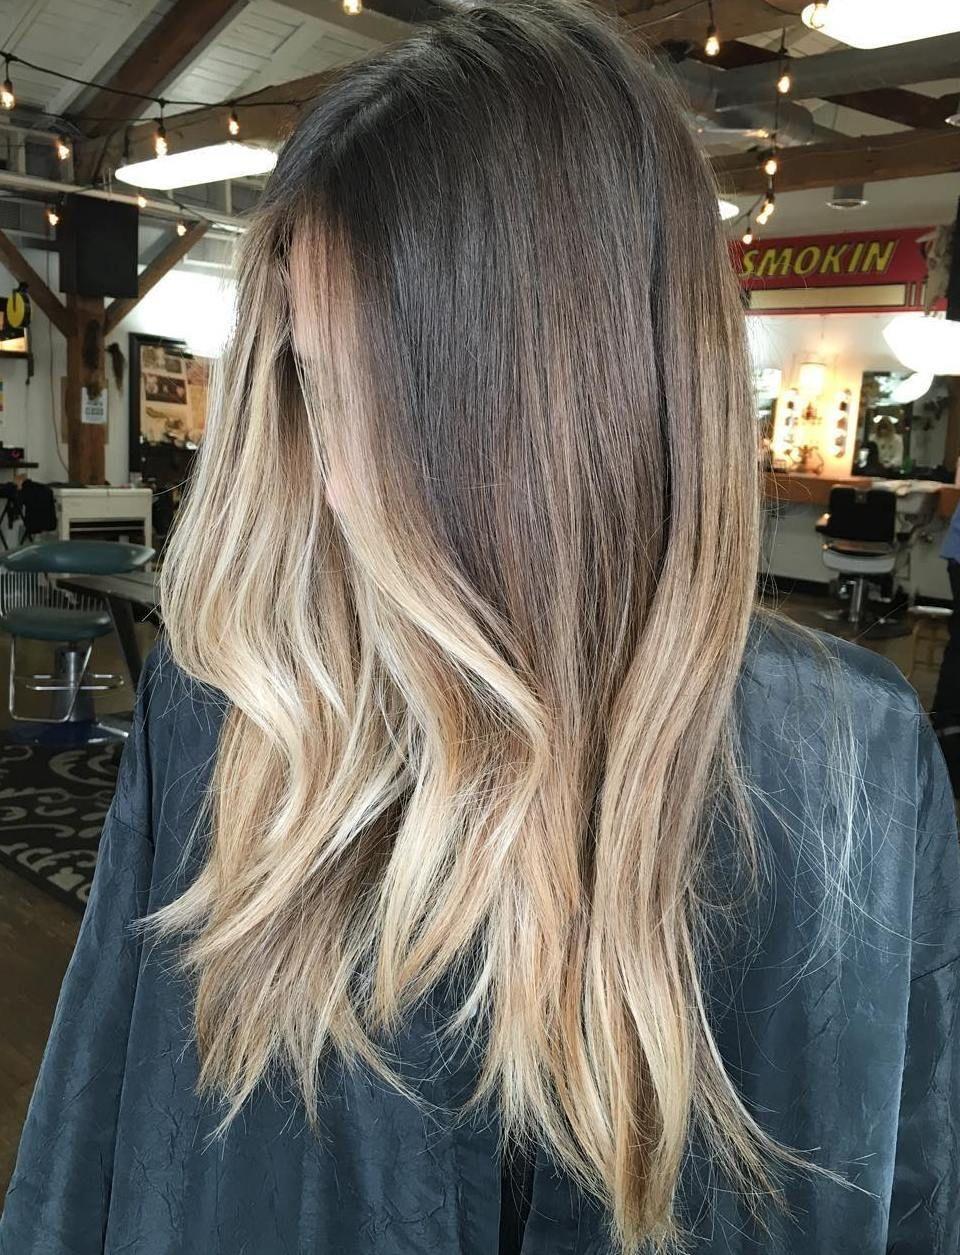 70 Flattering Balayage Hair Color Ideas For 2020 Hair Styles Ash Blonde Hair Effortless Hairstyles